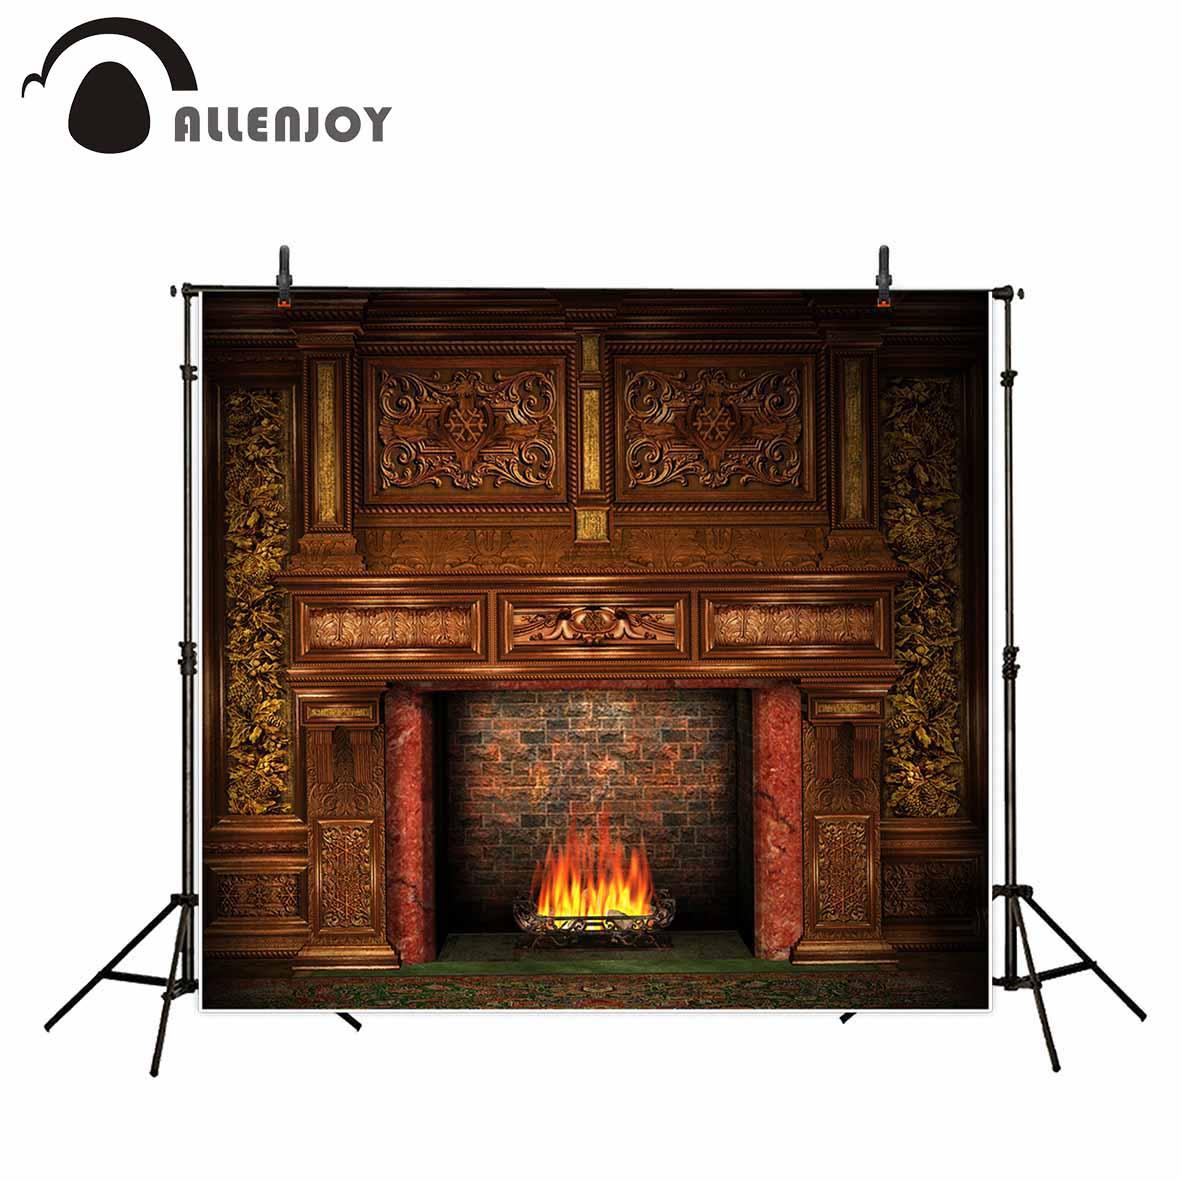 Allenjoy fundo para estúdio de fotos vintage lareira de luxo natal tijolo background photobooth impresso newborn photocall